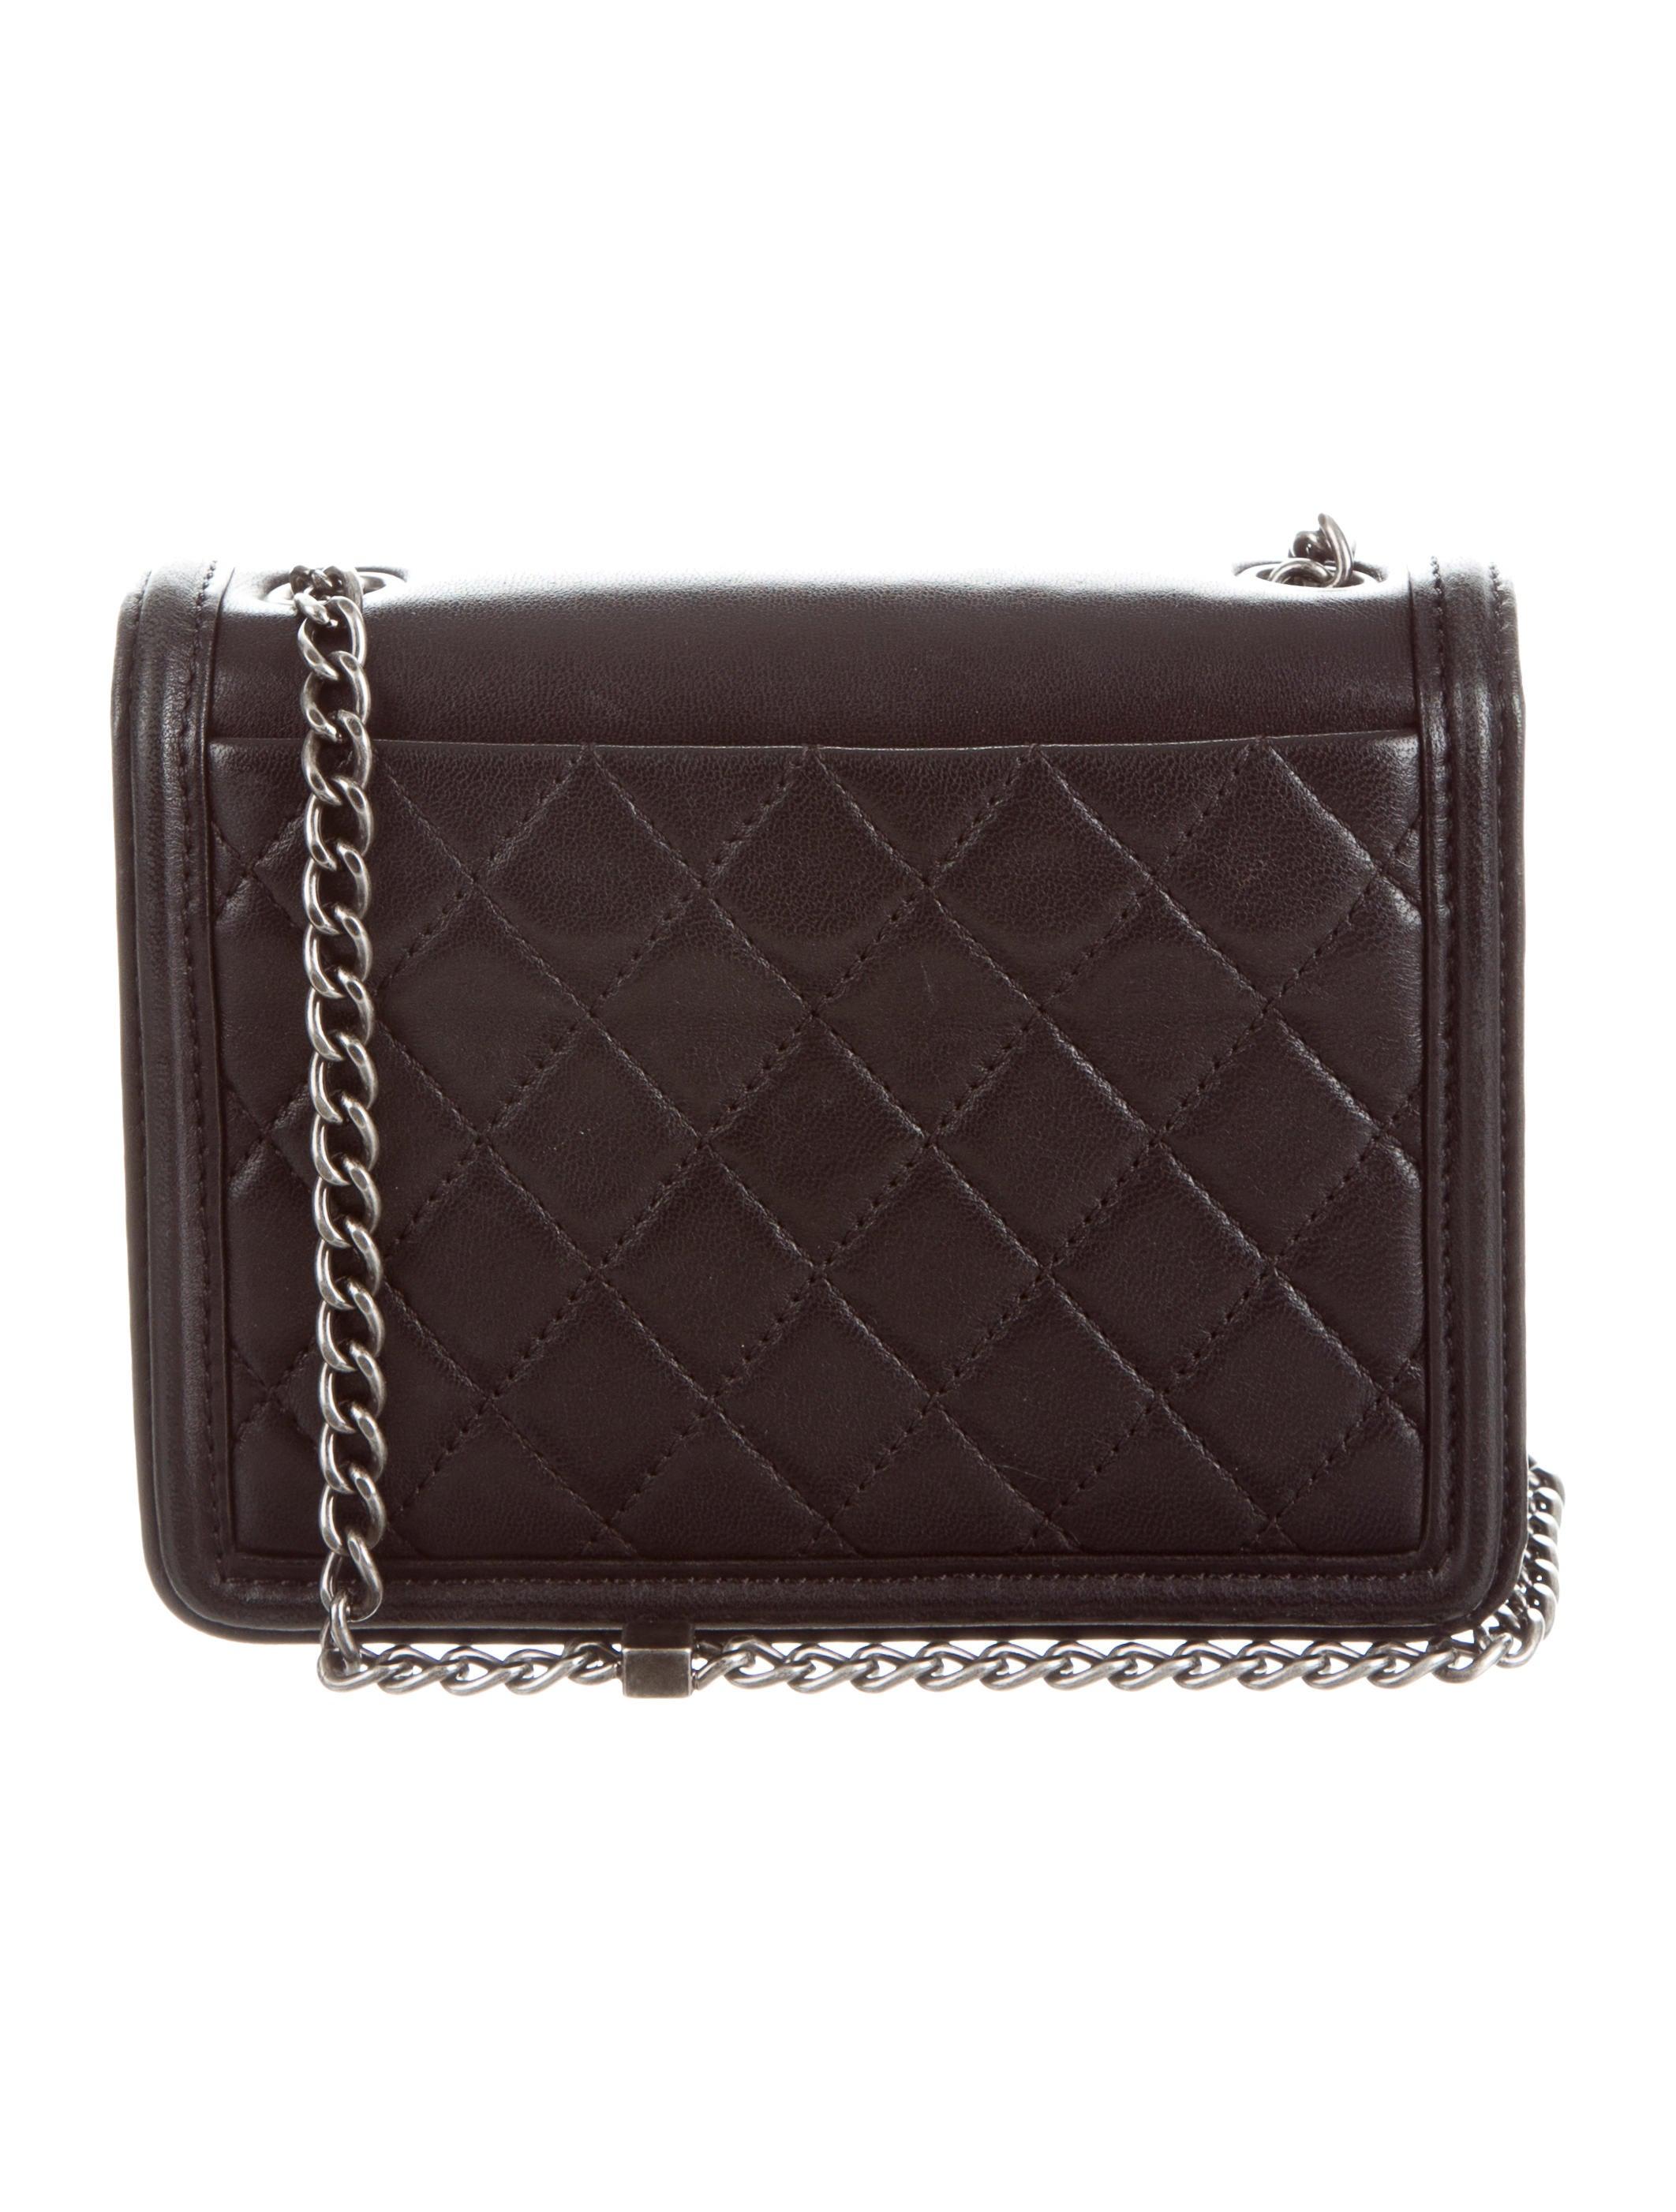 Chanel Boy Brick Flap Bag Handbags Cha185816 The